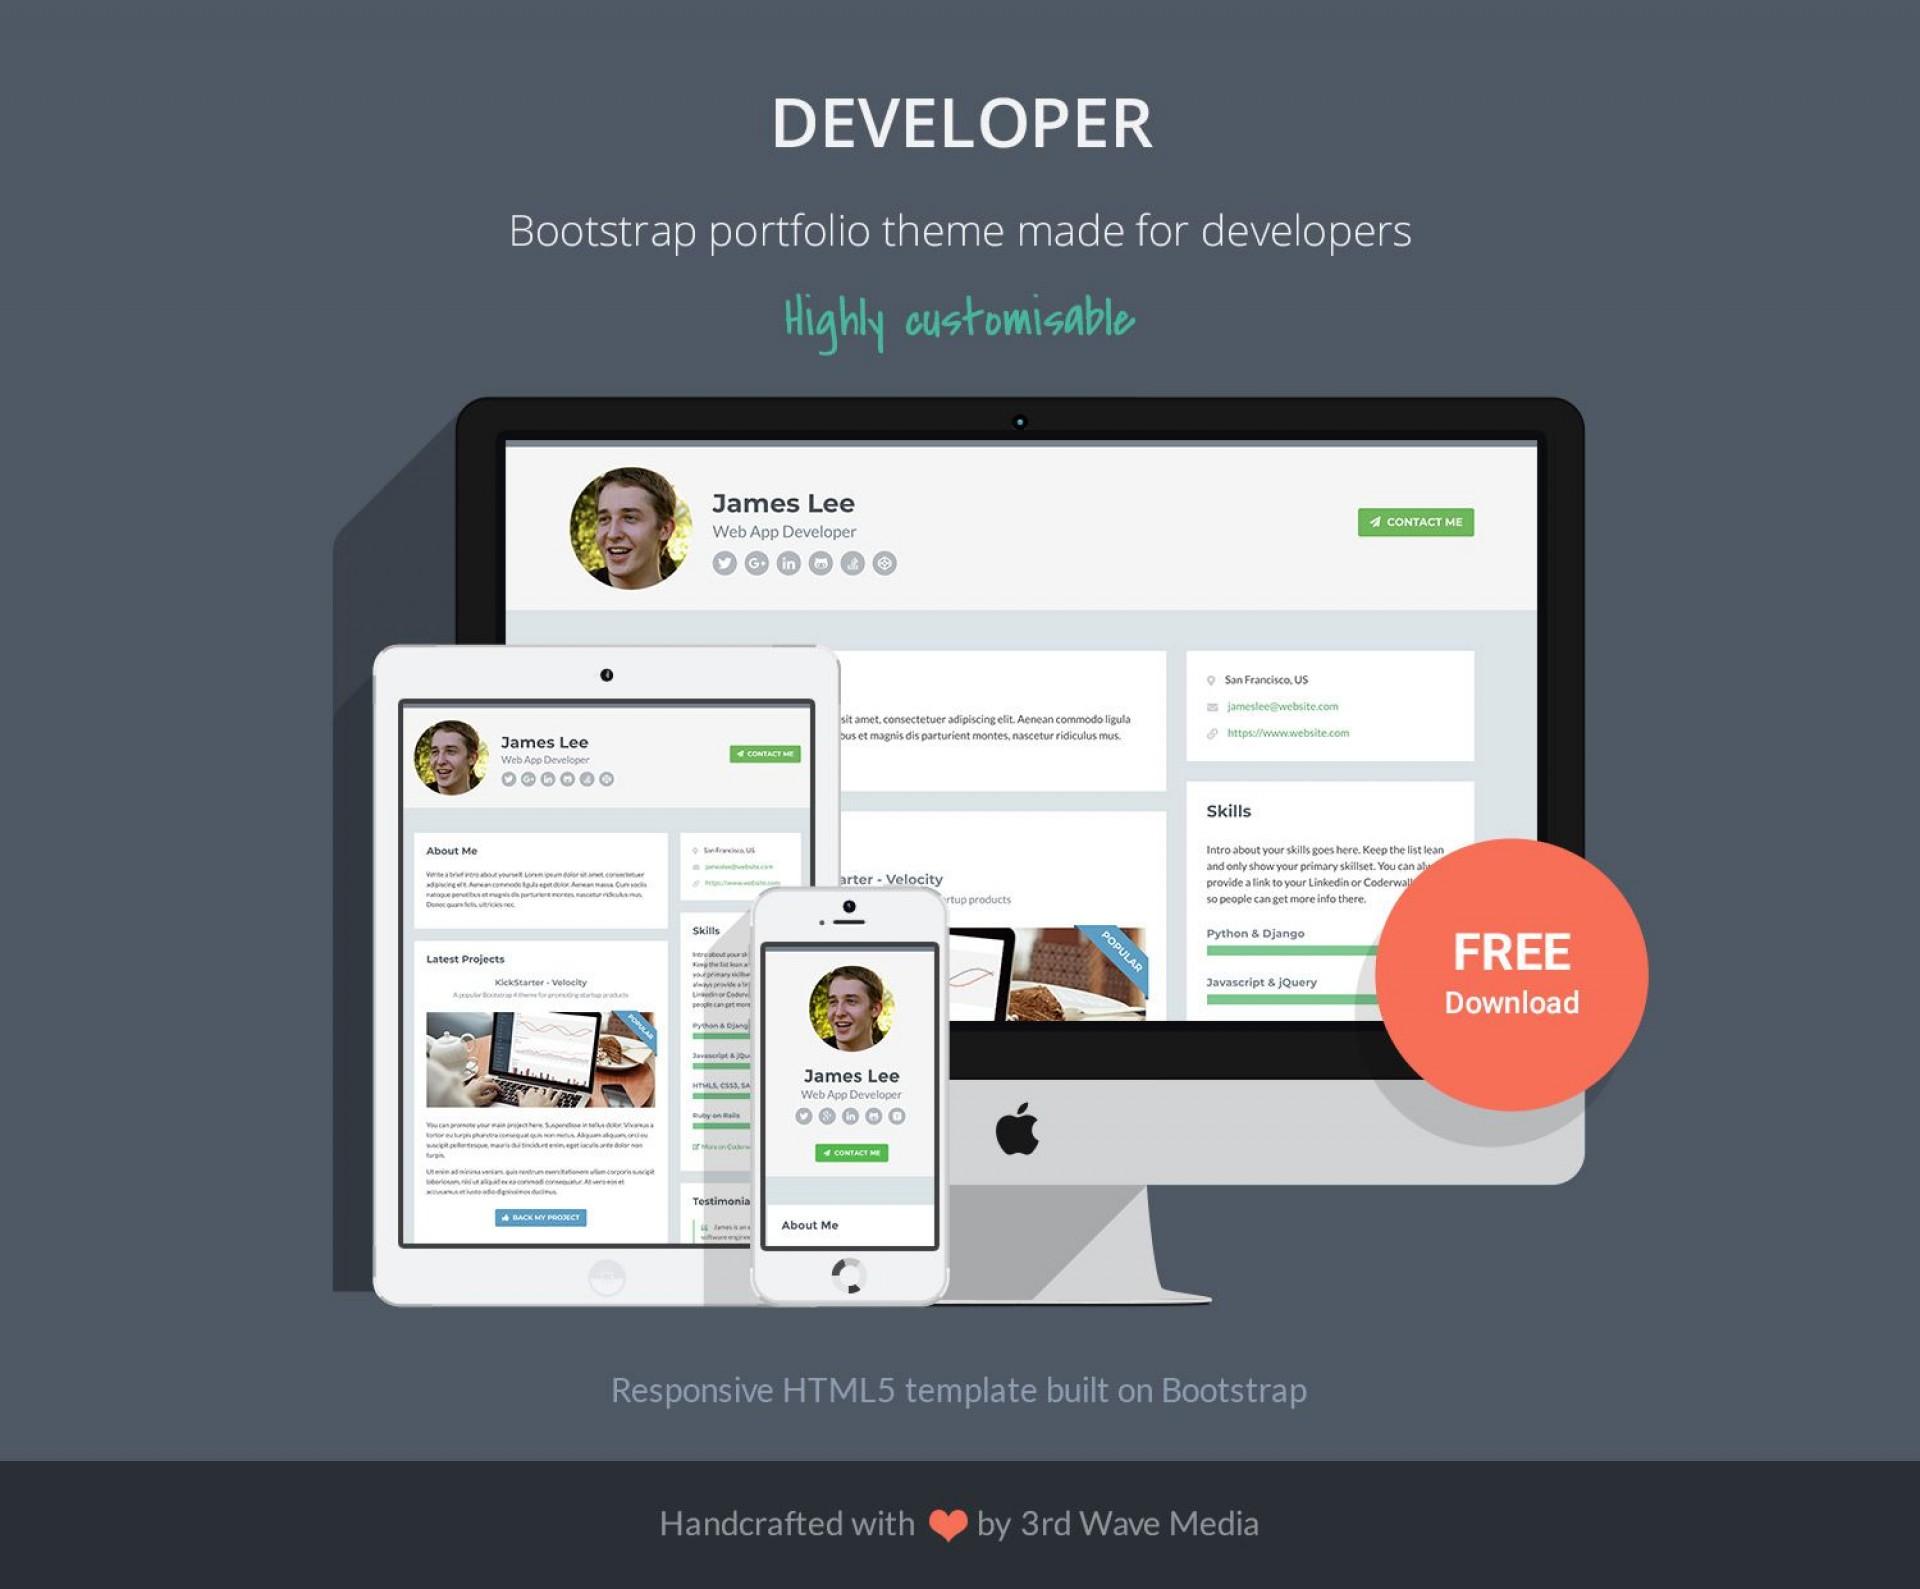 002 Phenomenal Web Developer Portfolio Template Picture  Templates Best Design Theme Free Wordpres1920